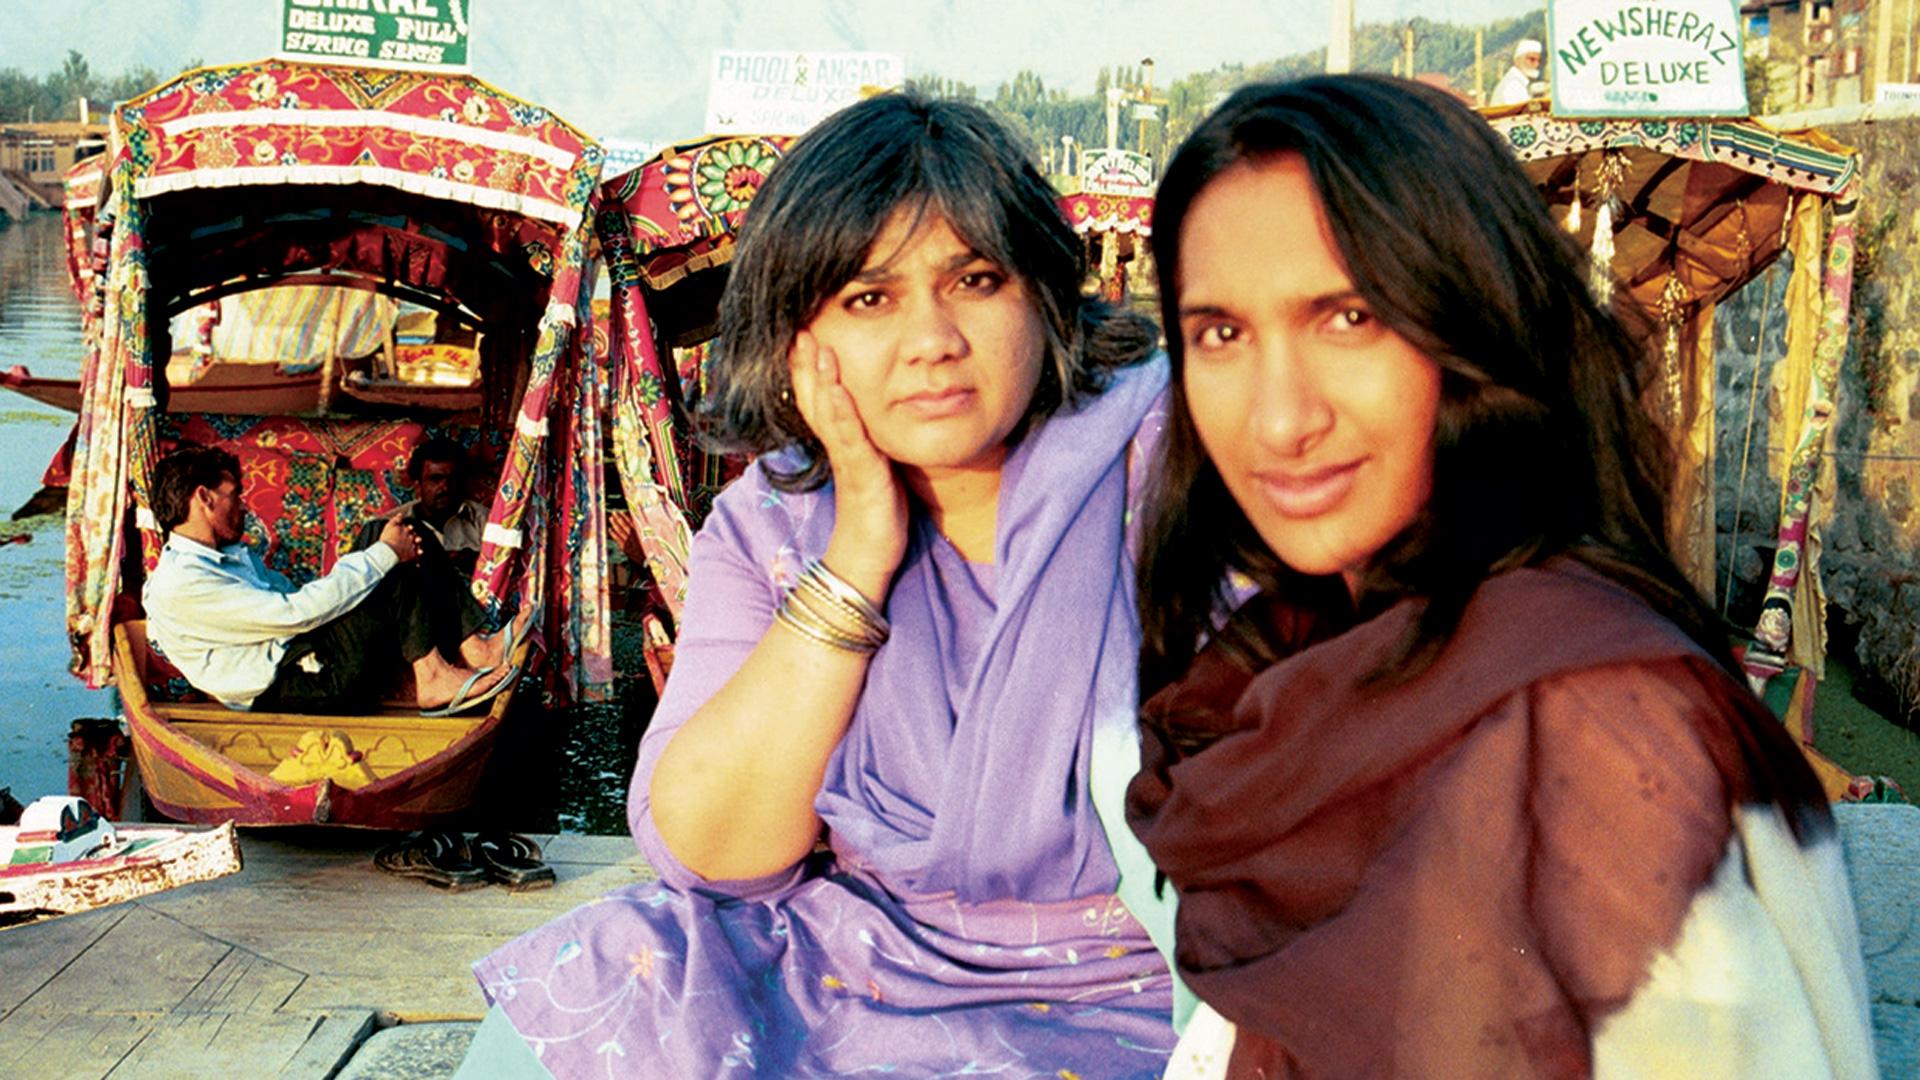 Human Rights Watch Film Festival 2008: Project Kashmir